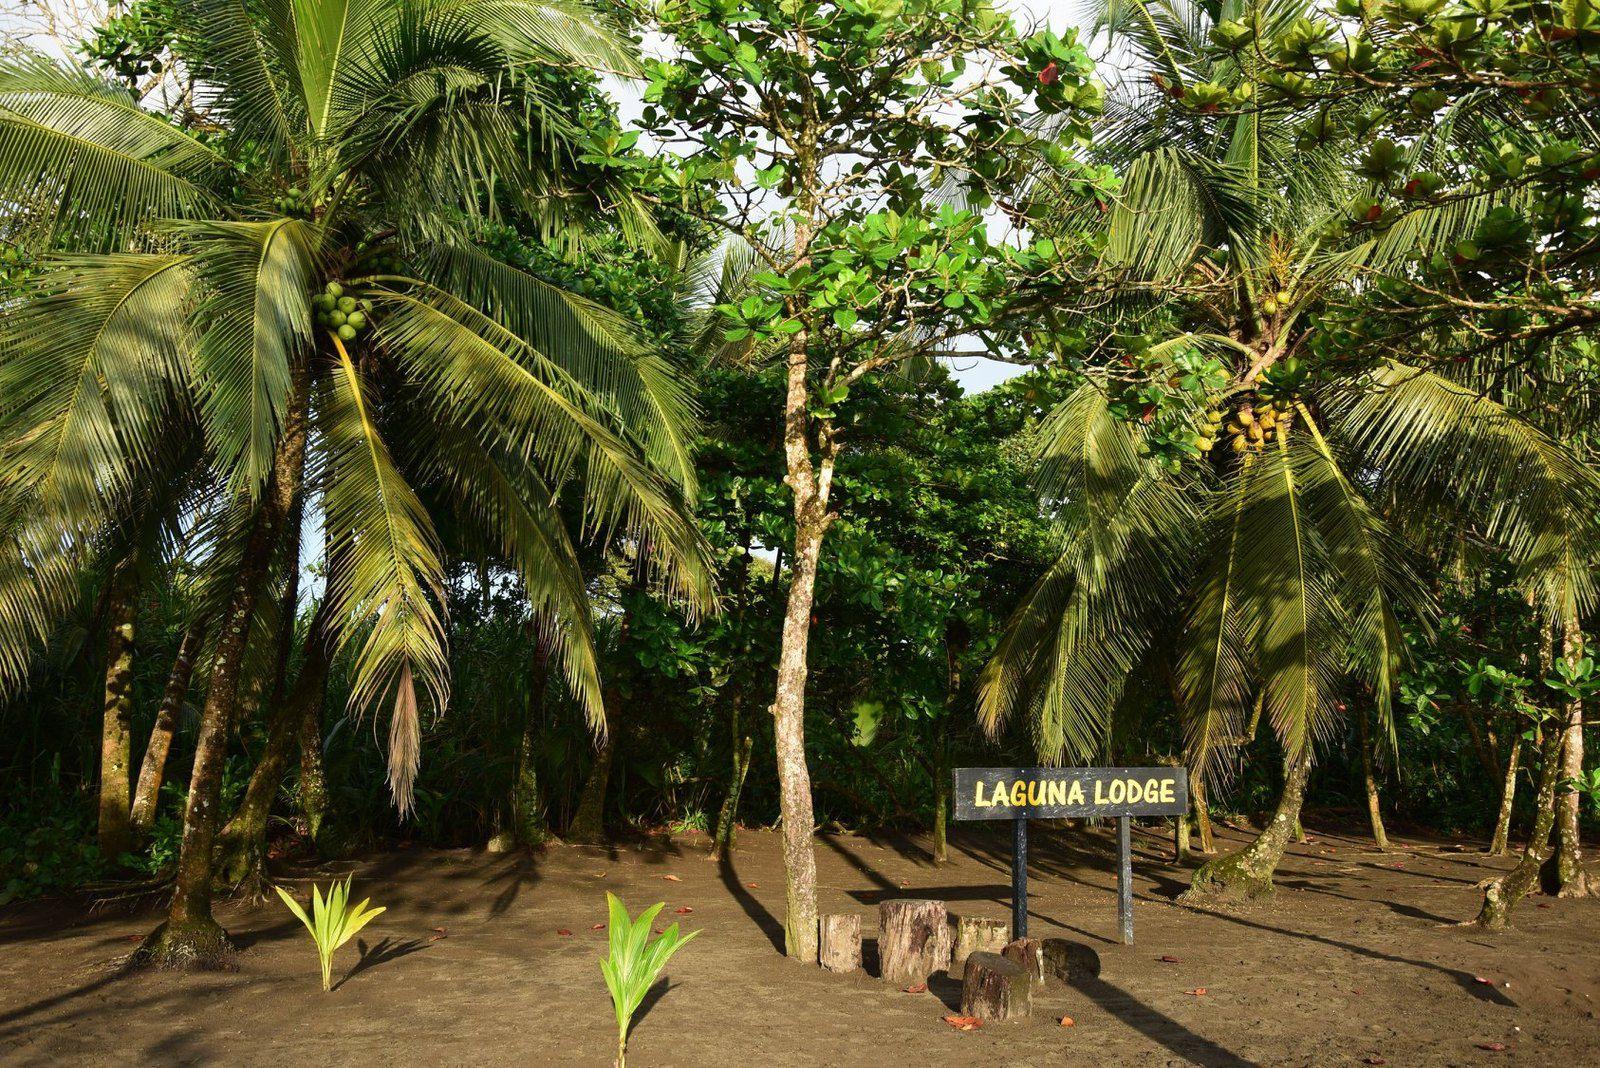 Les plages du Laguna Lodge, Caribbean beach